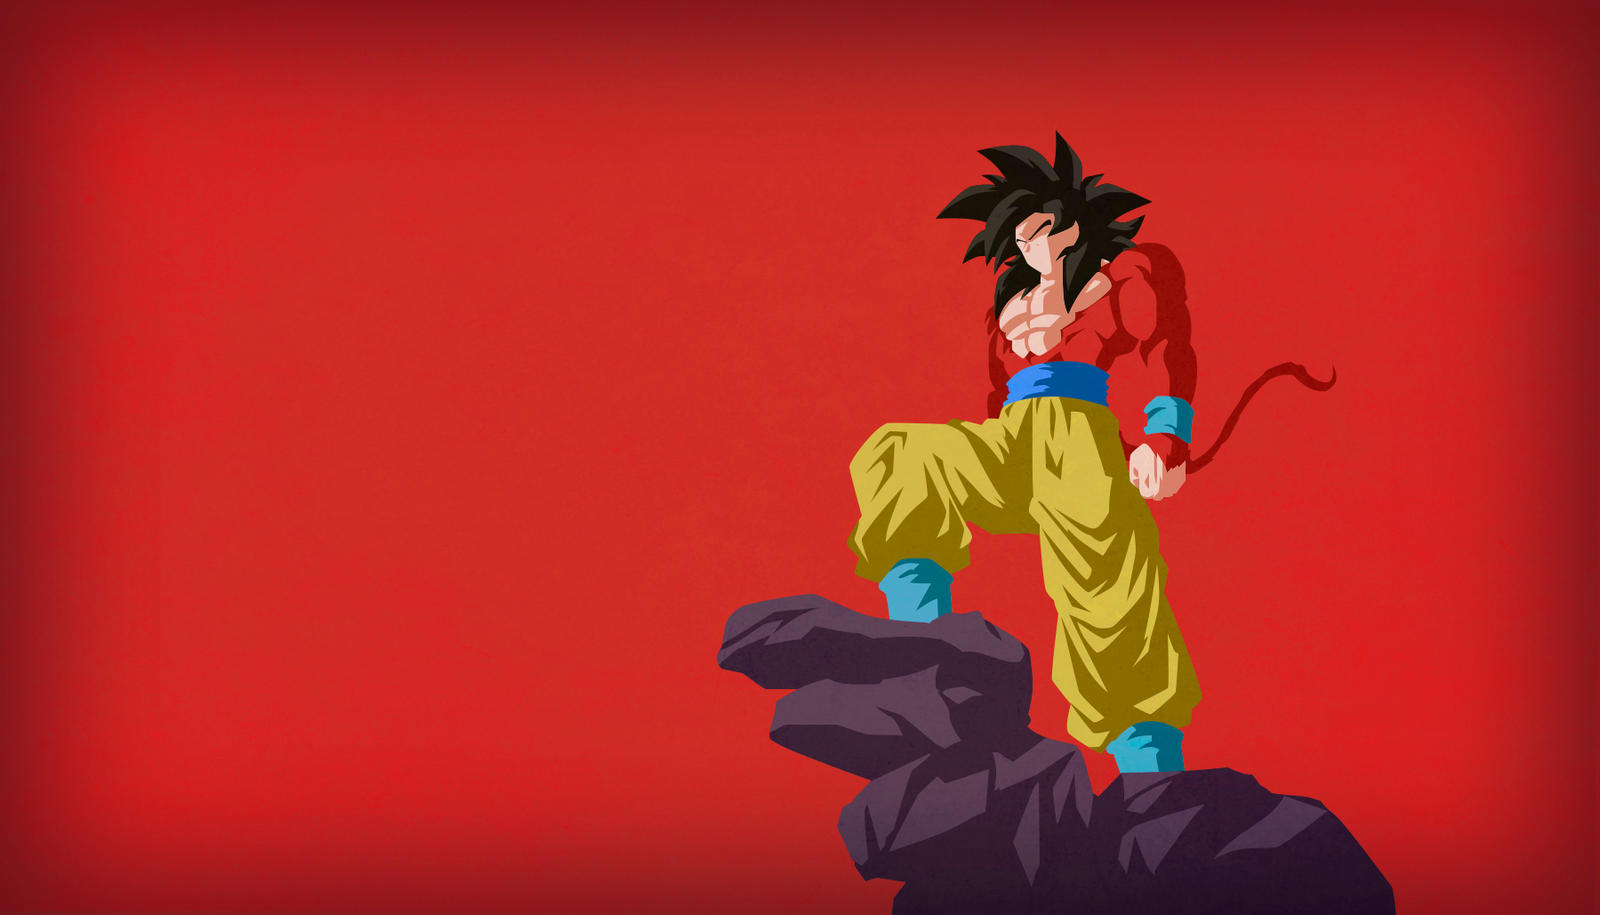 Goku ssj4 v2 minimalist wallpaper by horira21 on deviantart - Ssj4 vegeta wallpaper ...